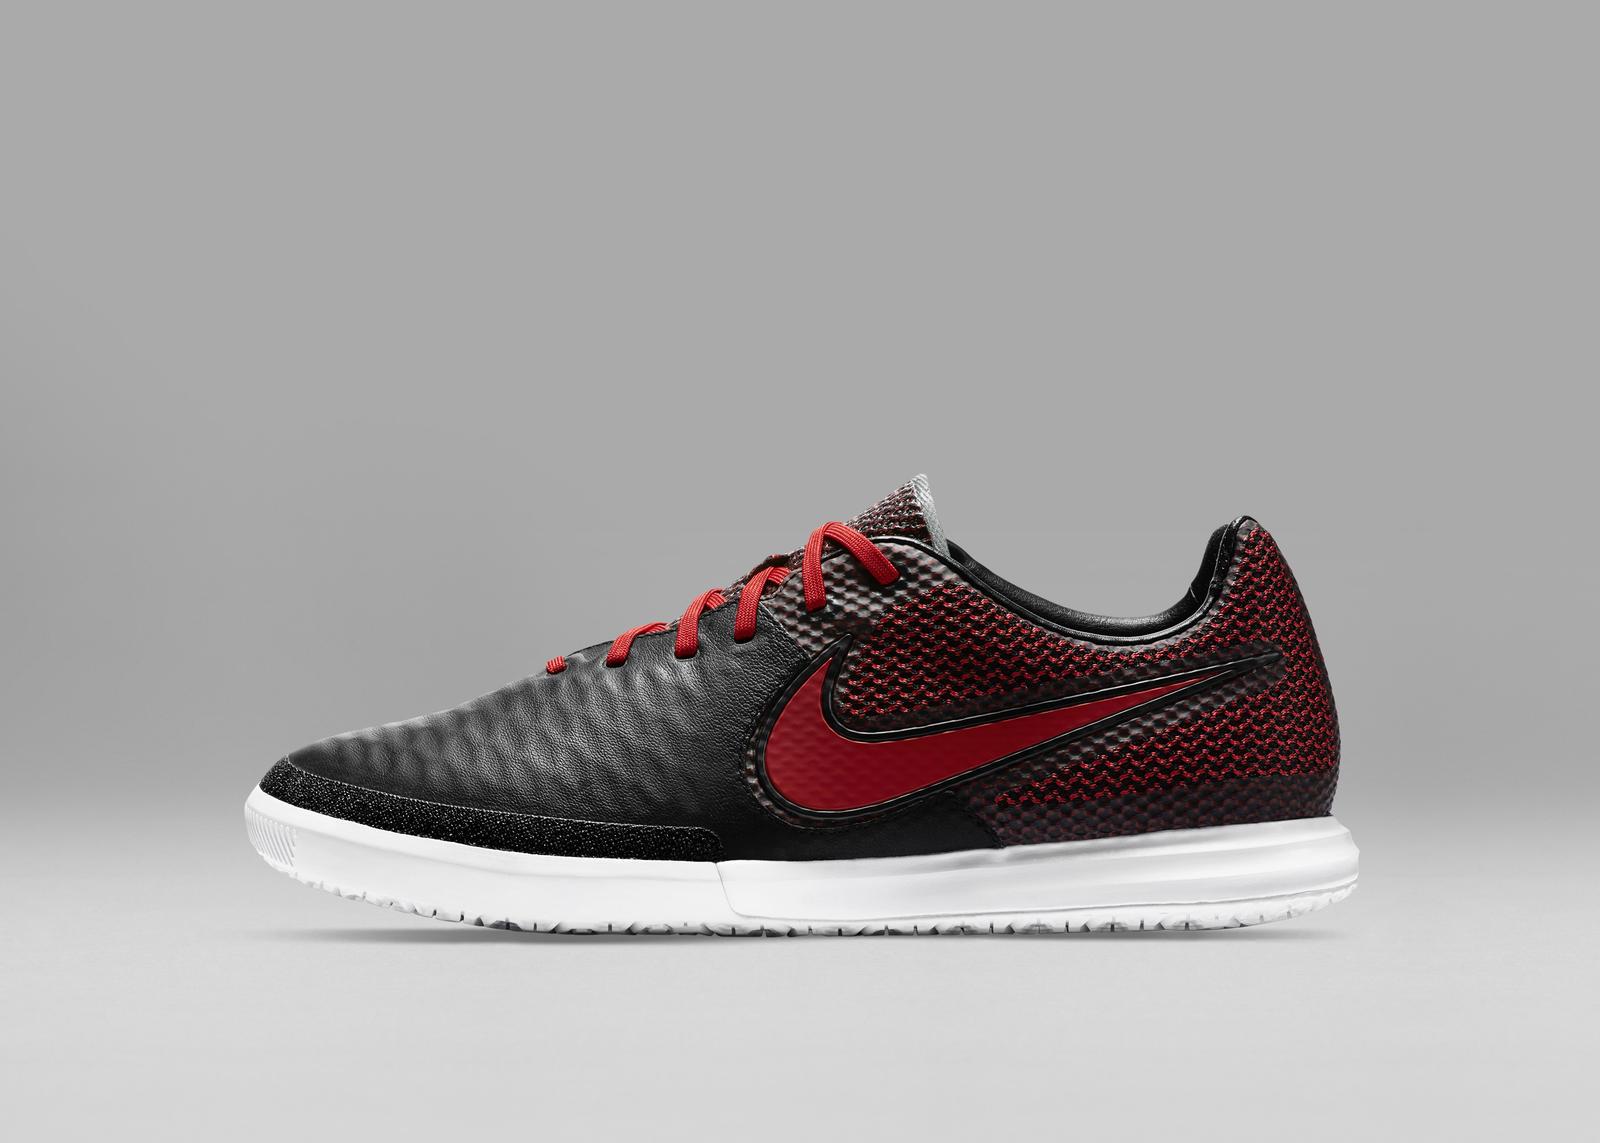 Nike-Football-Soccer_NFX_STREET_MAGISTAX_FINALE_IC_99_PREM